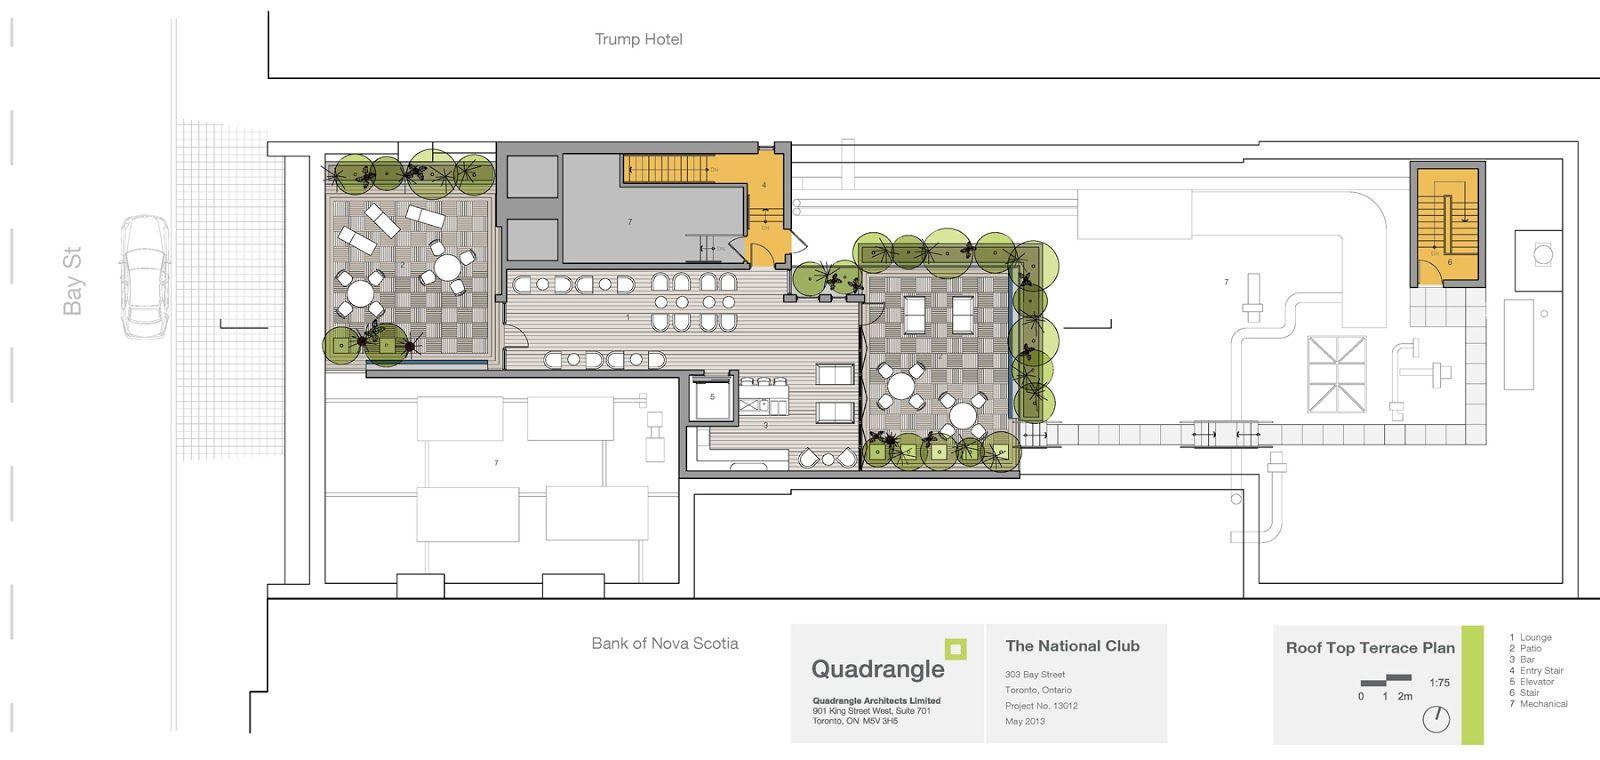 National Club Rooftop Patio Floor Plan Patio Flooring Rooftop Patio Floor Plans